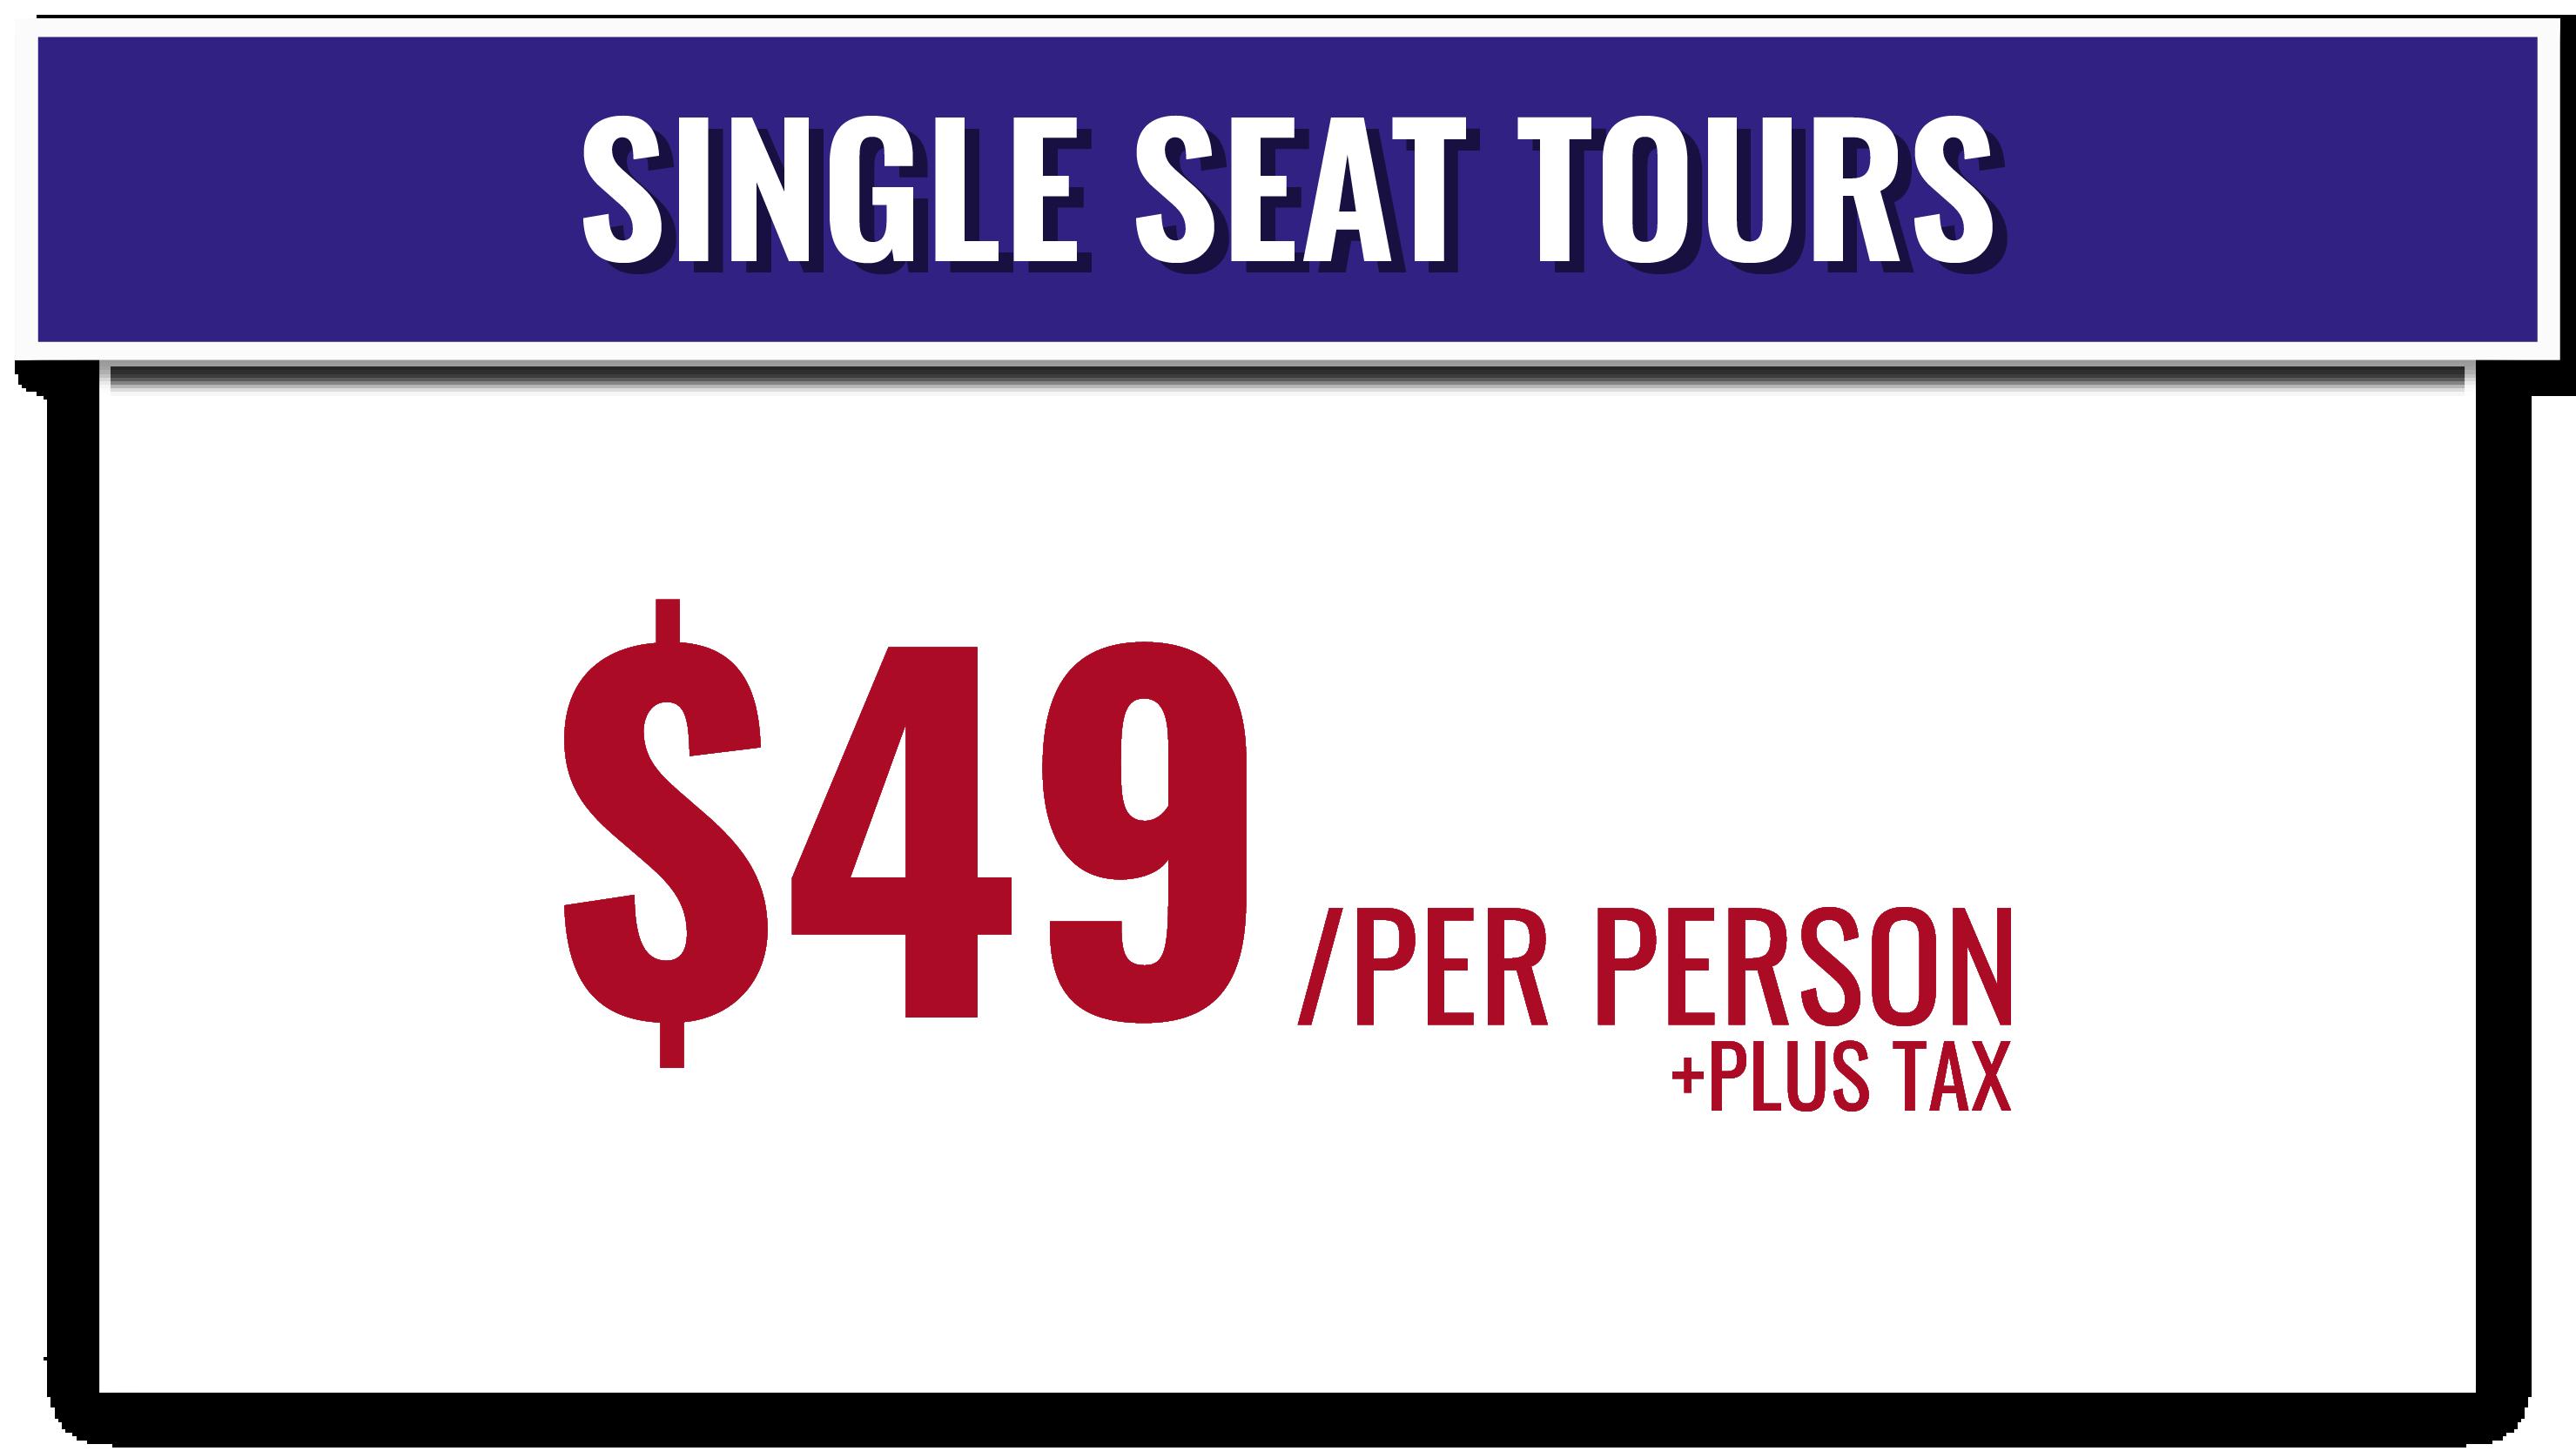 Ultimate Party Bus Single Seat Tour Pricing | Nashville, TN